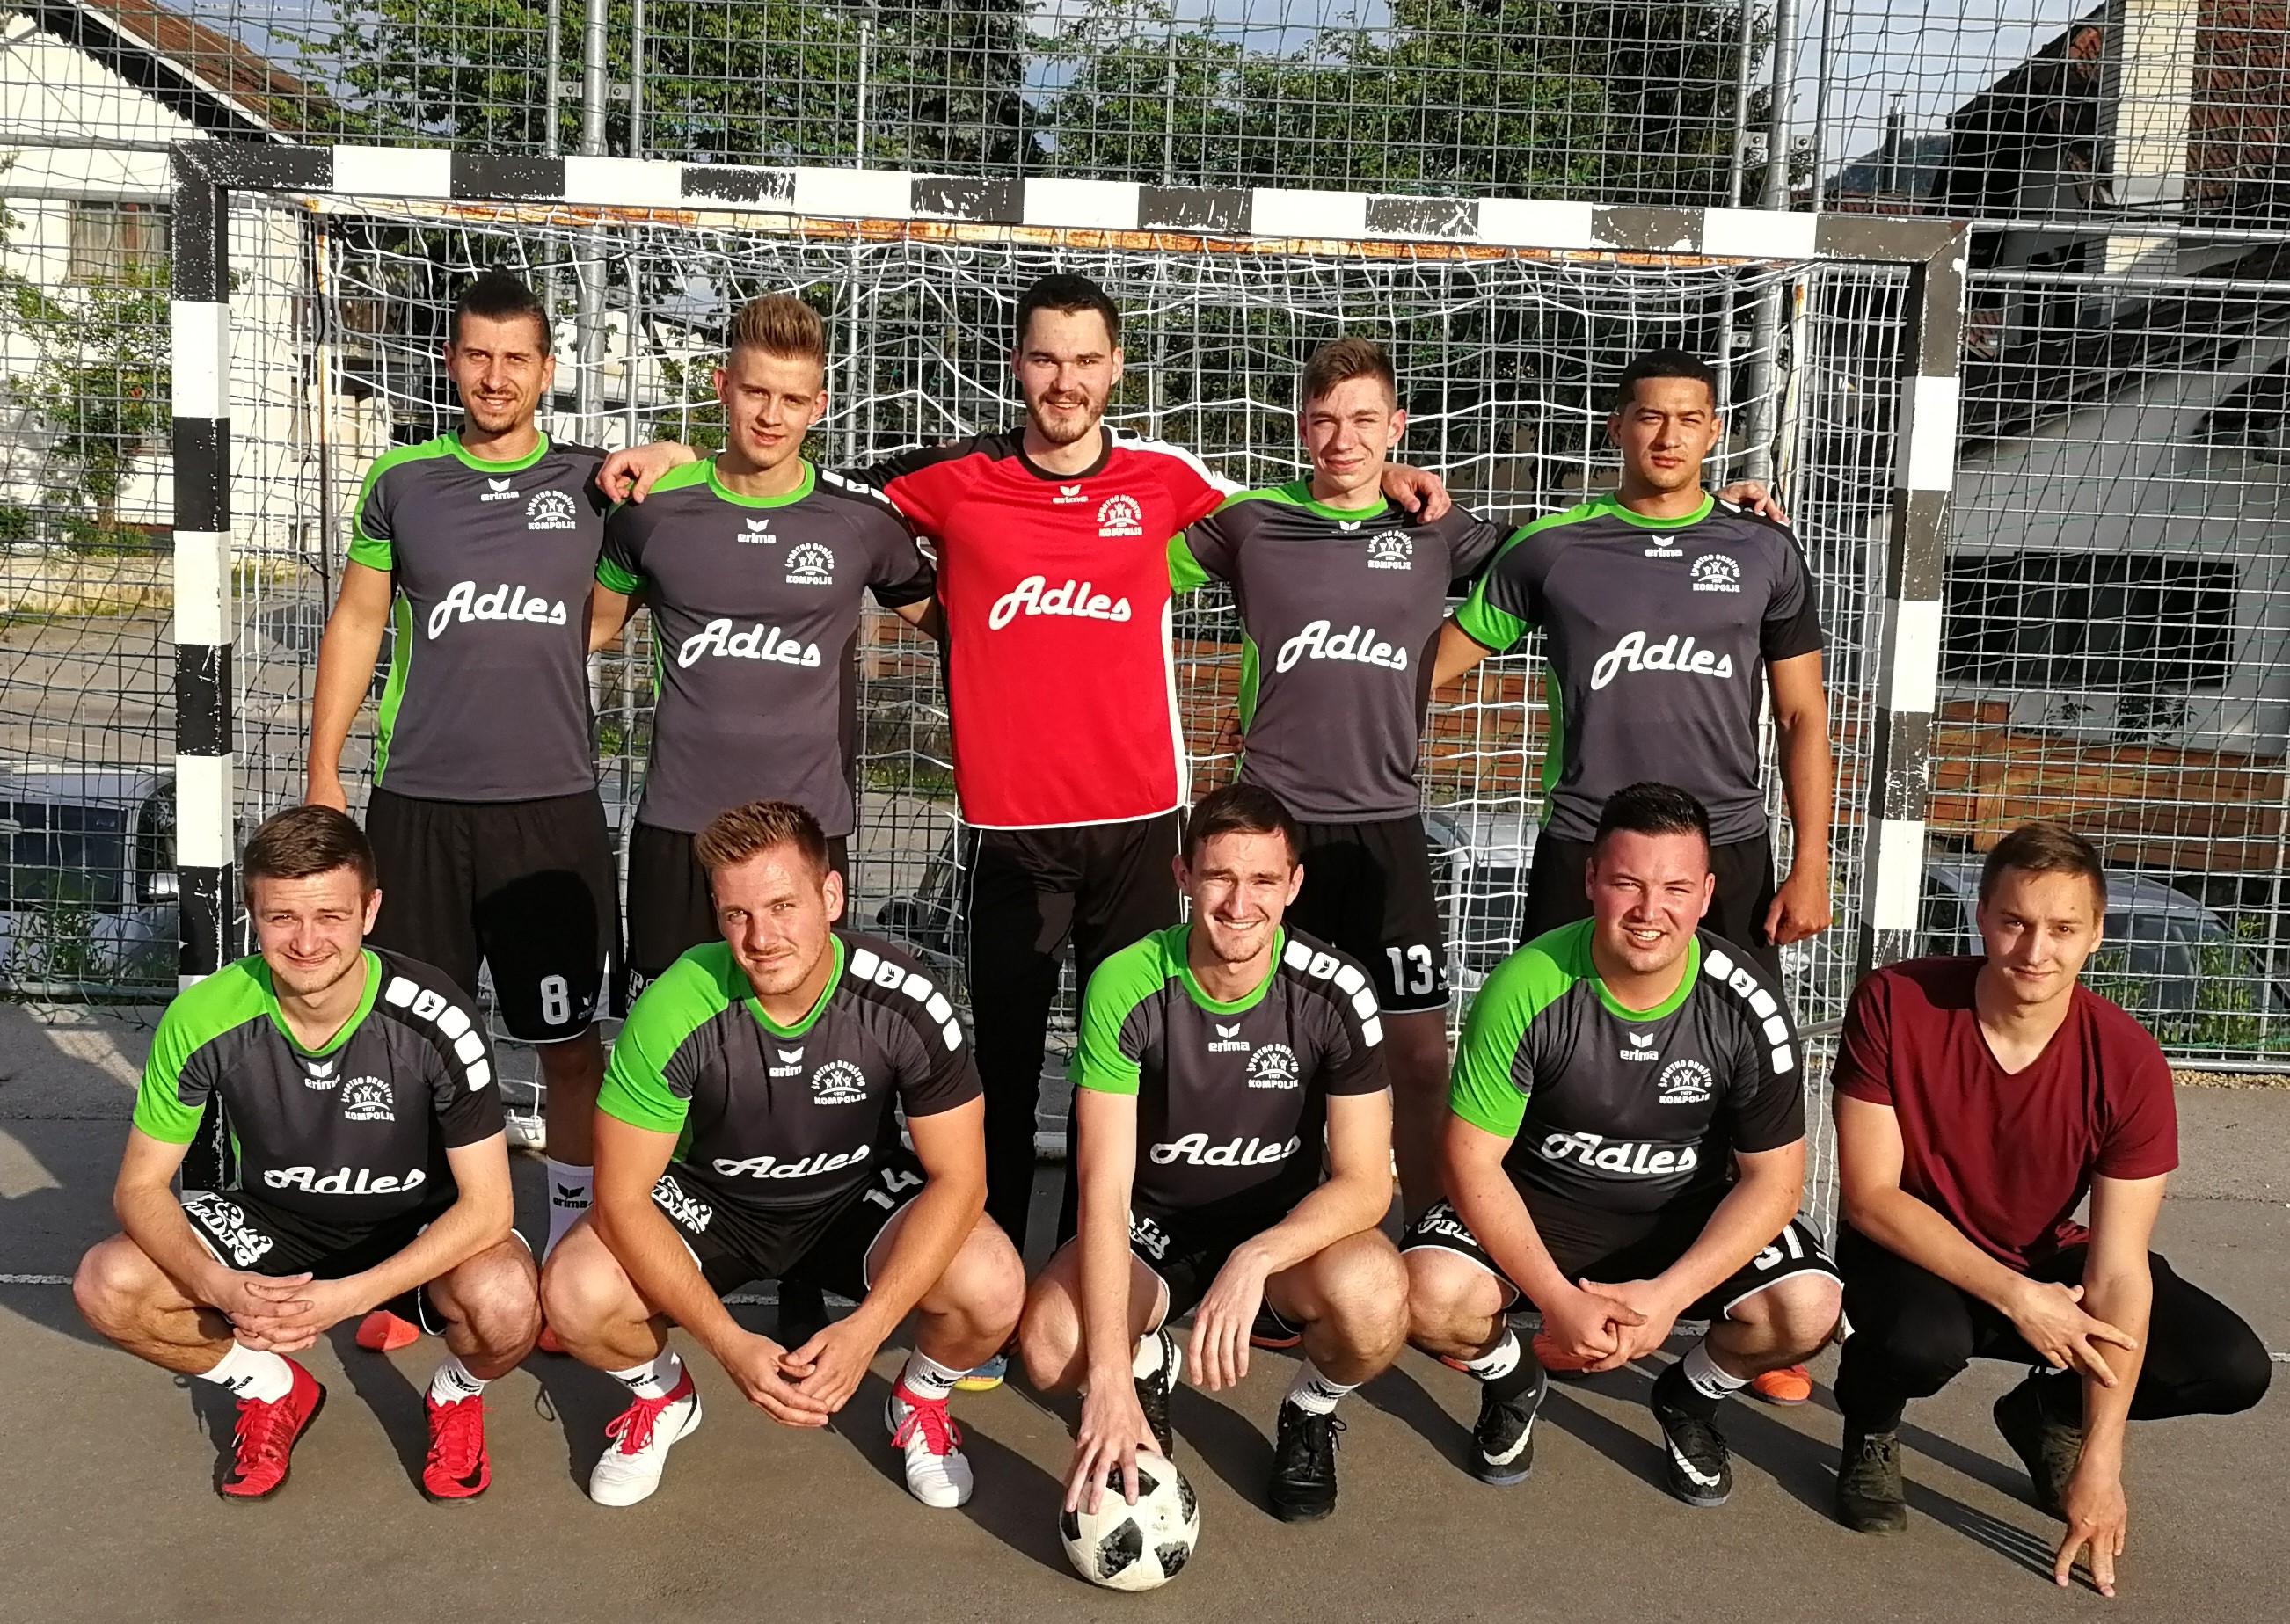 Dobrepoljska futsal liga 2018